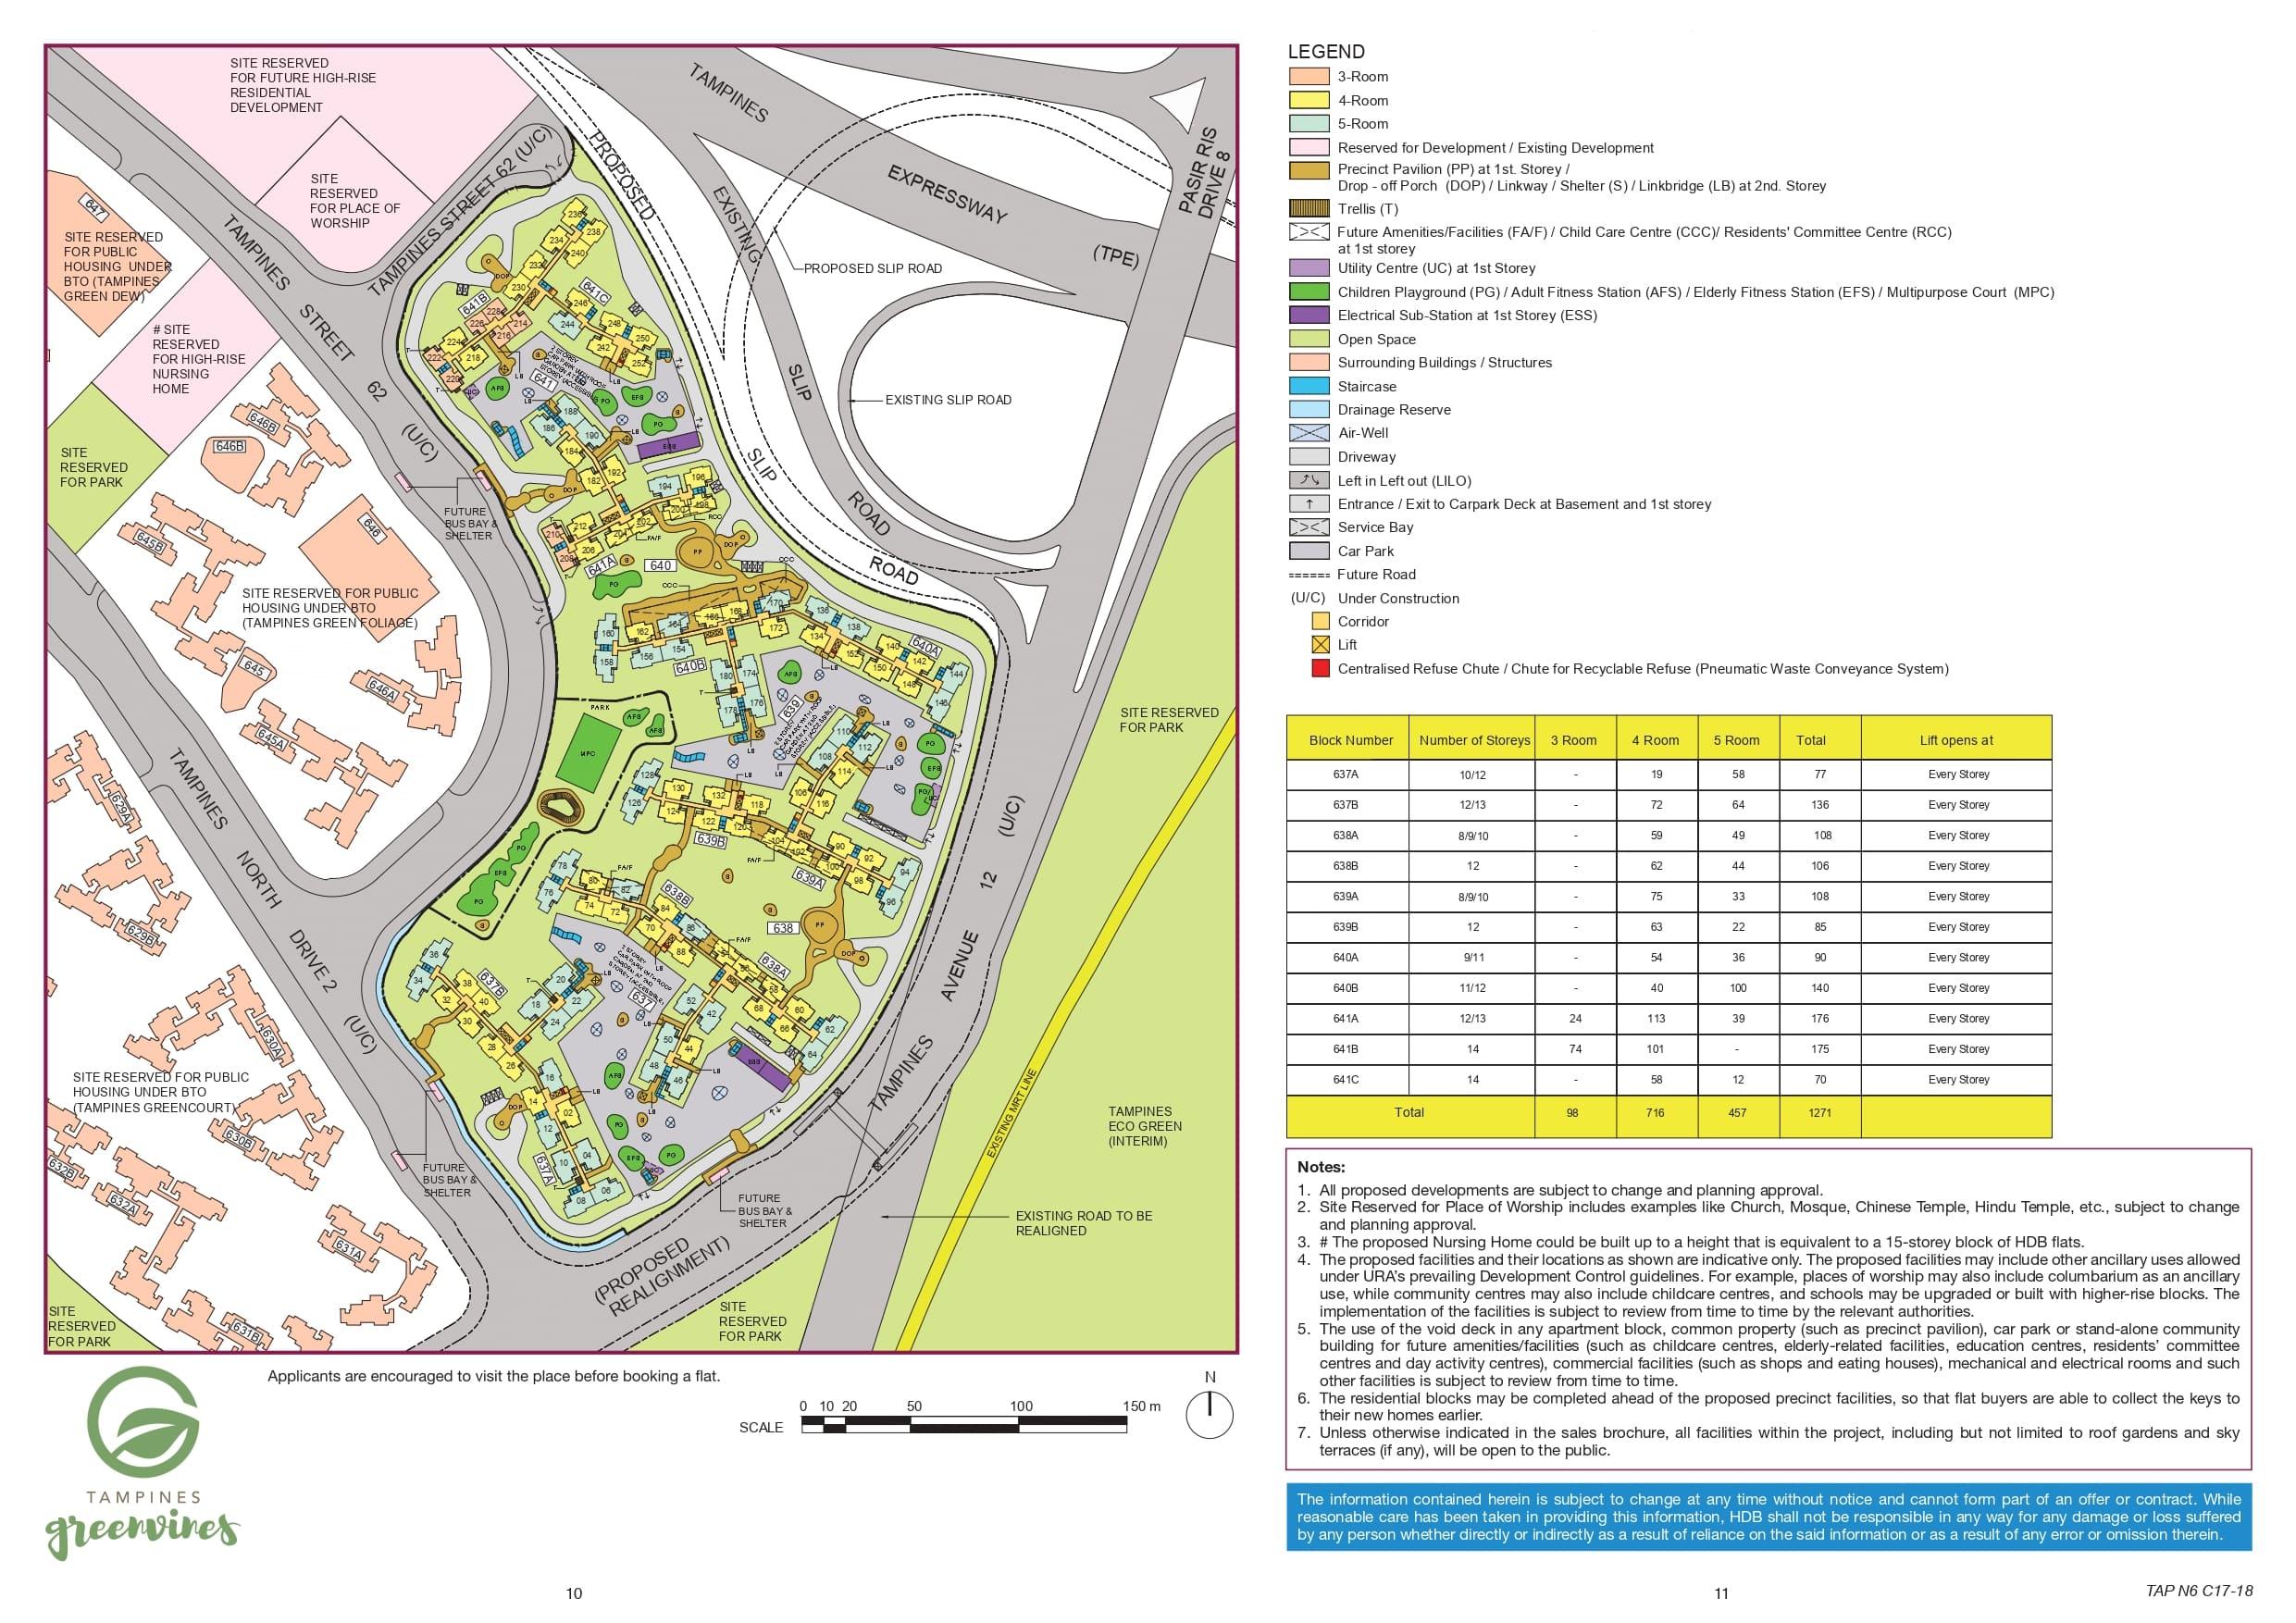 Tampines GreenVines Site Plan